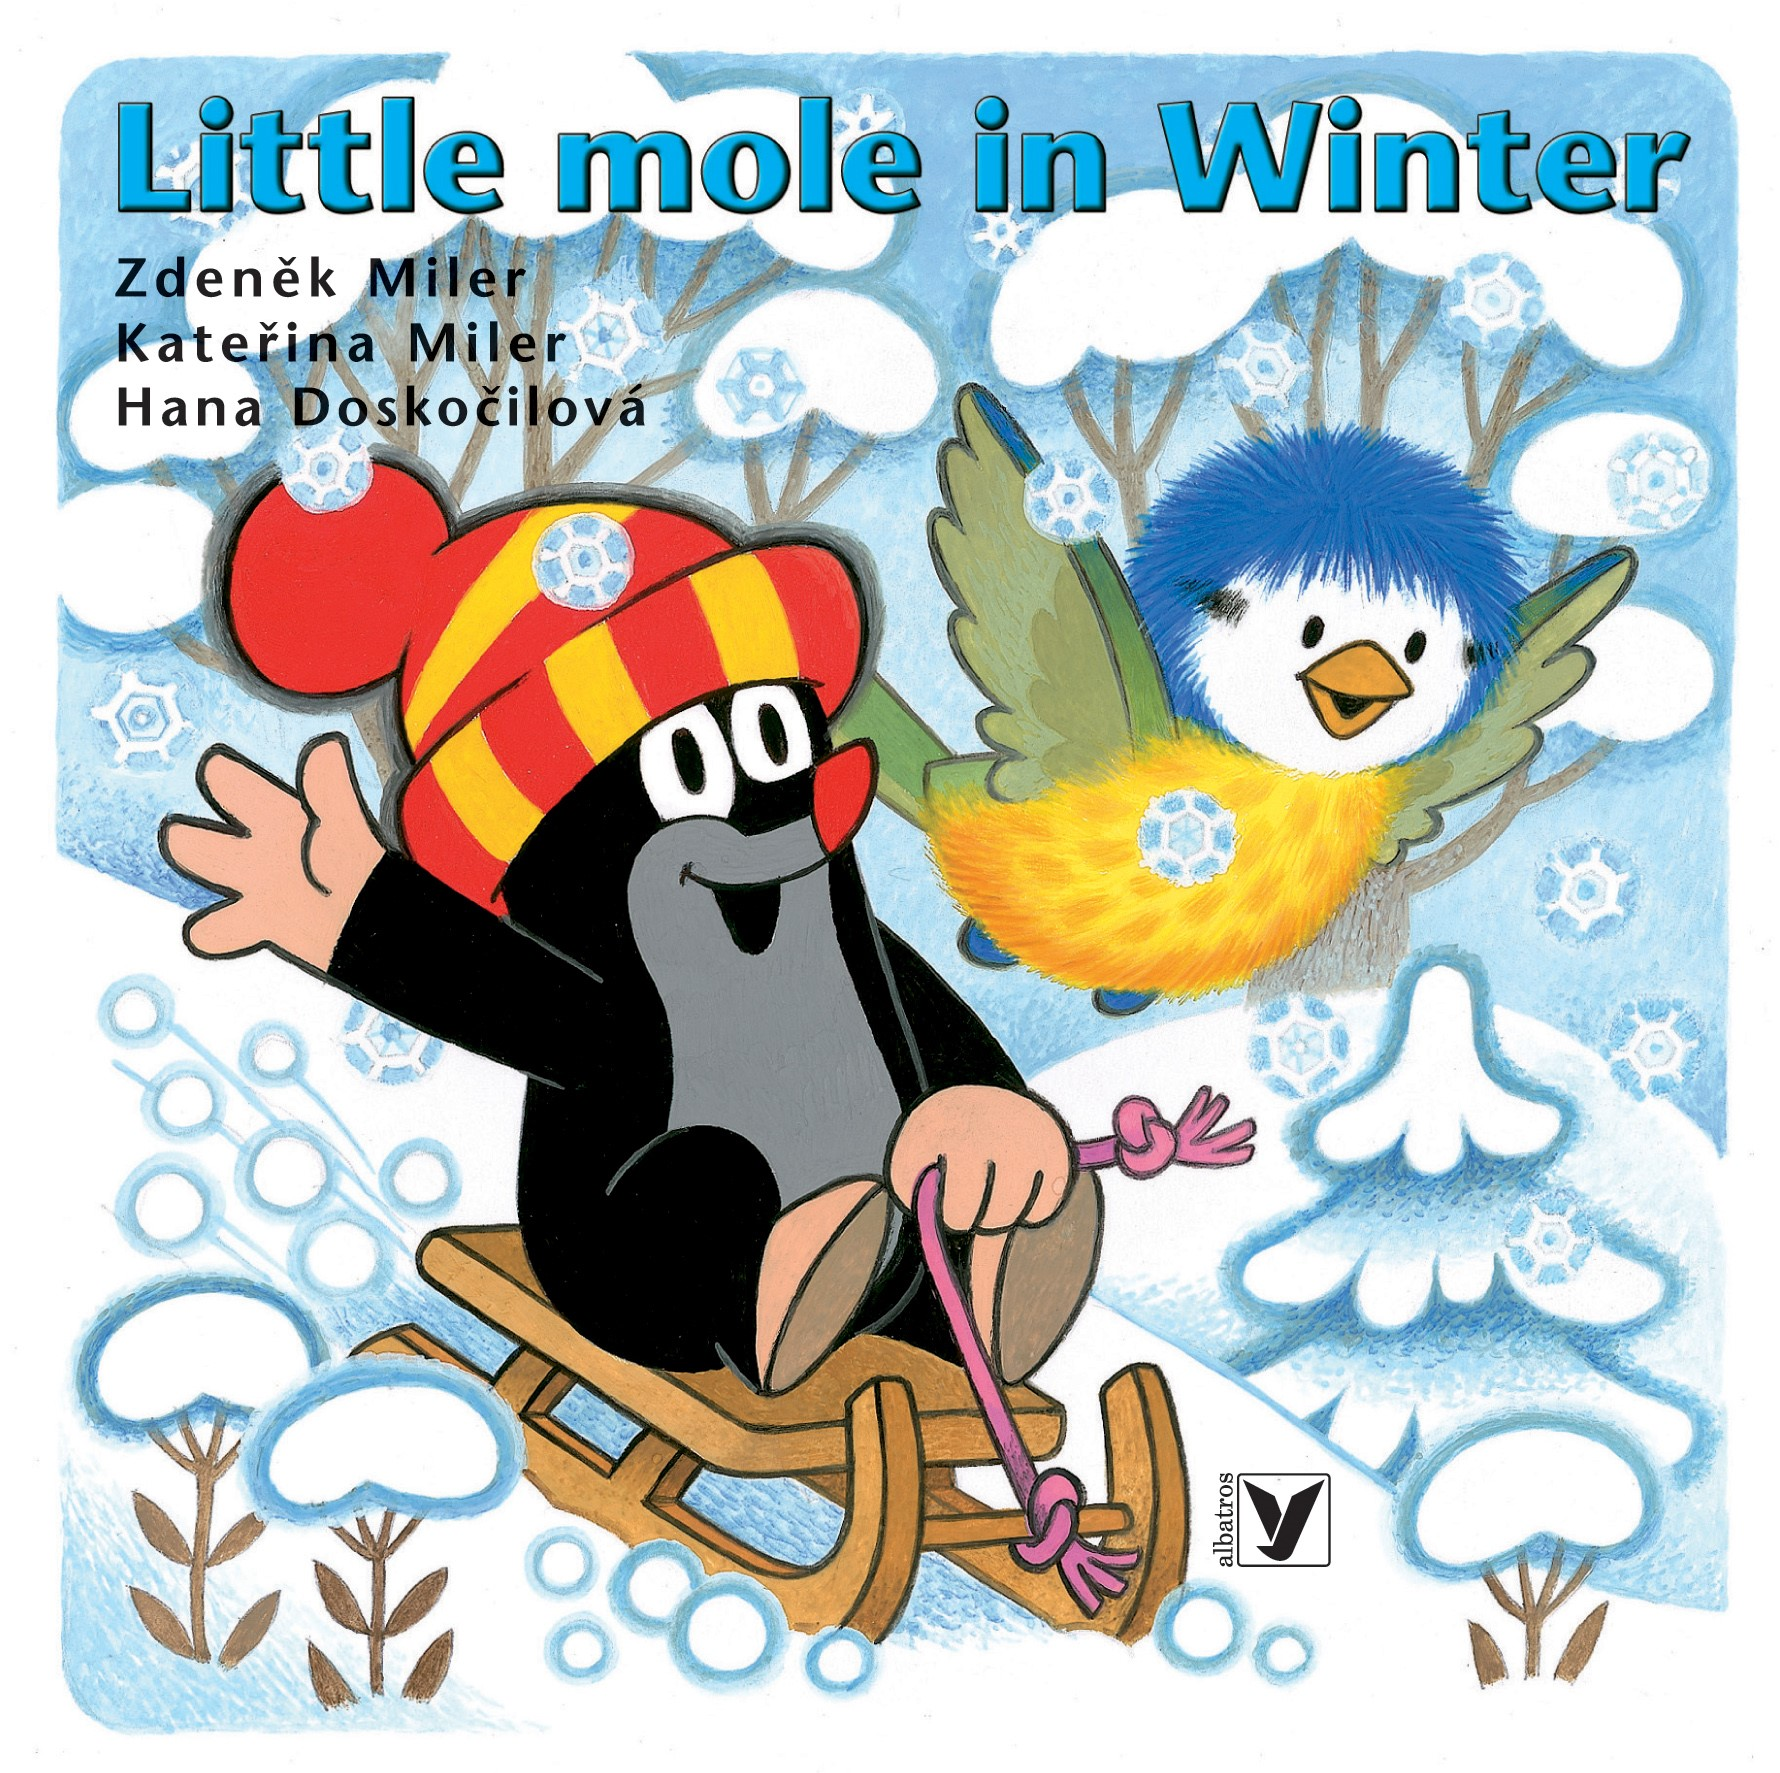 Little Mole in Winter | Kateřina Miler, Hana Doskočilová, Zdeněk Miler